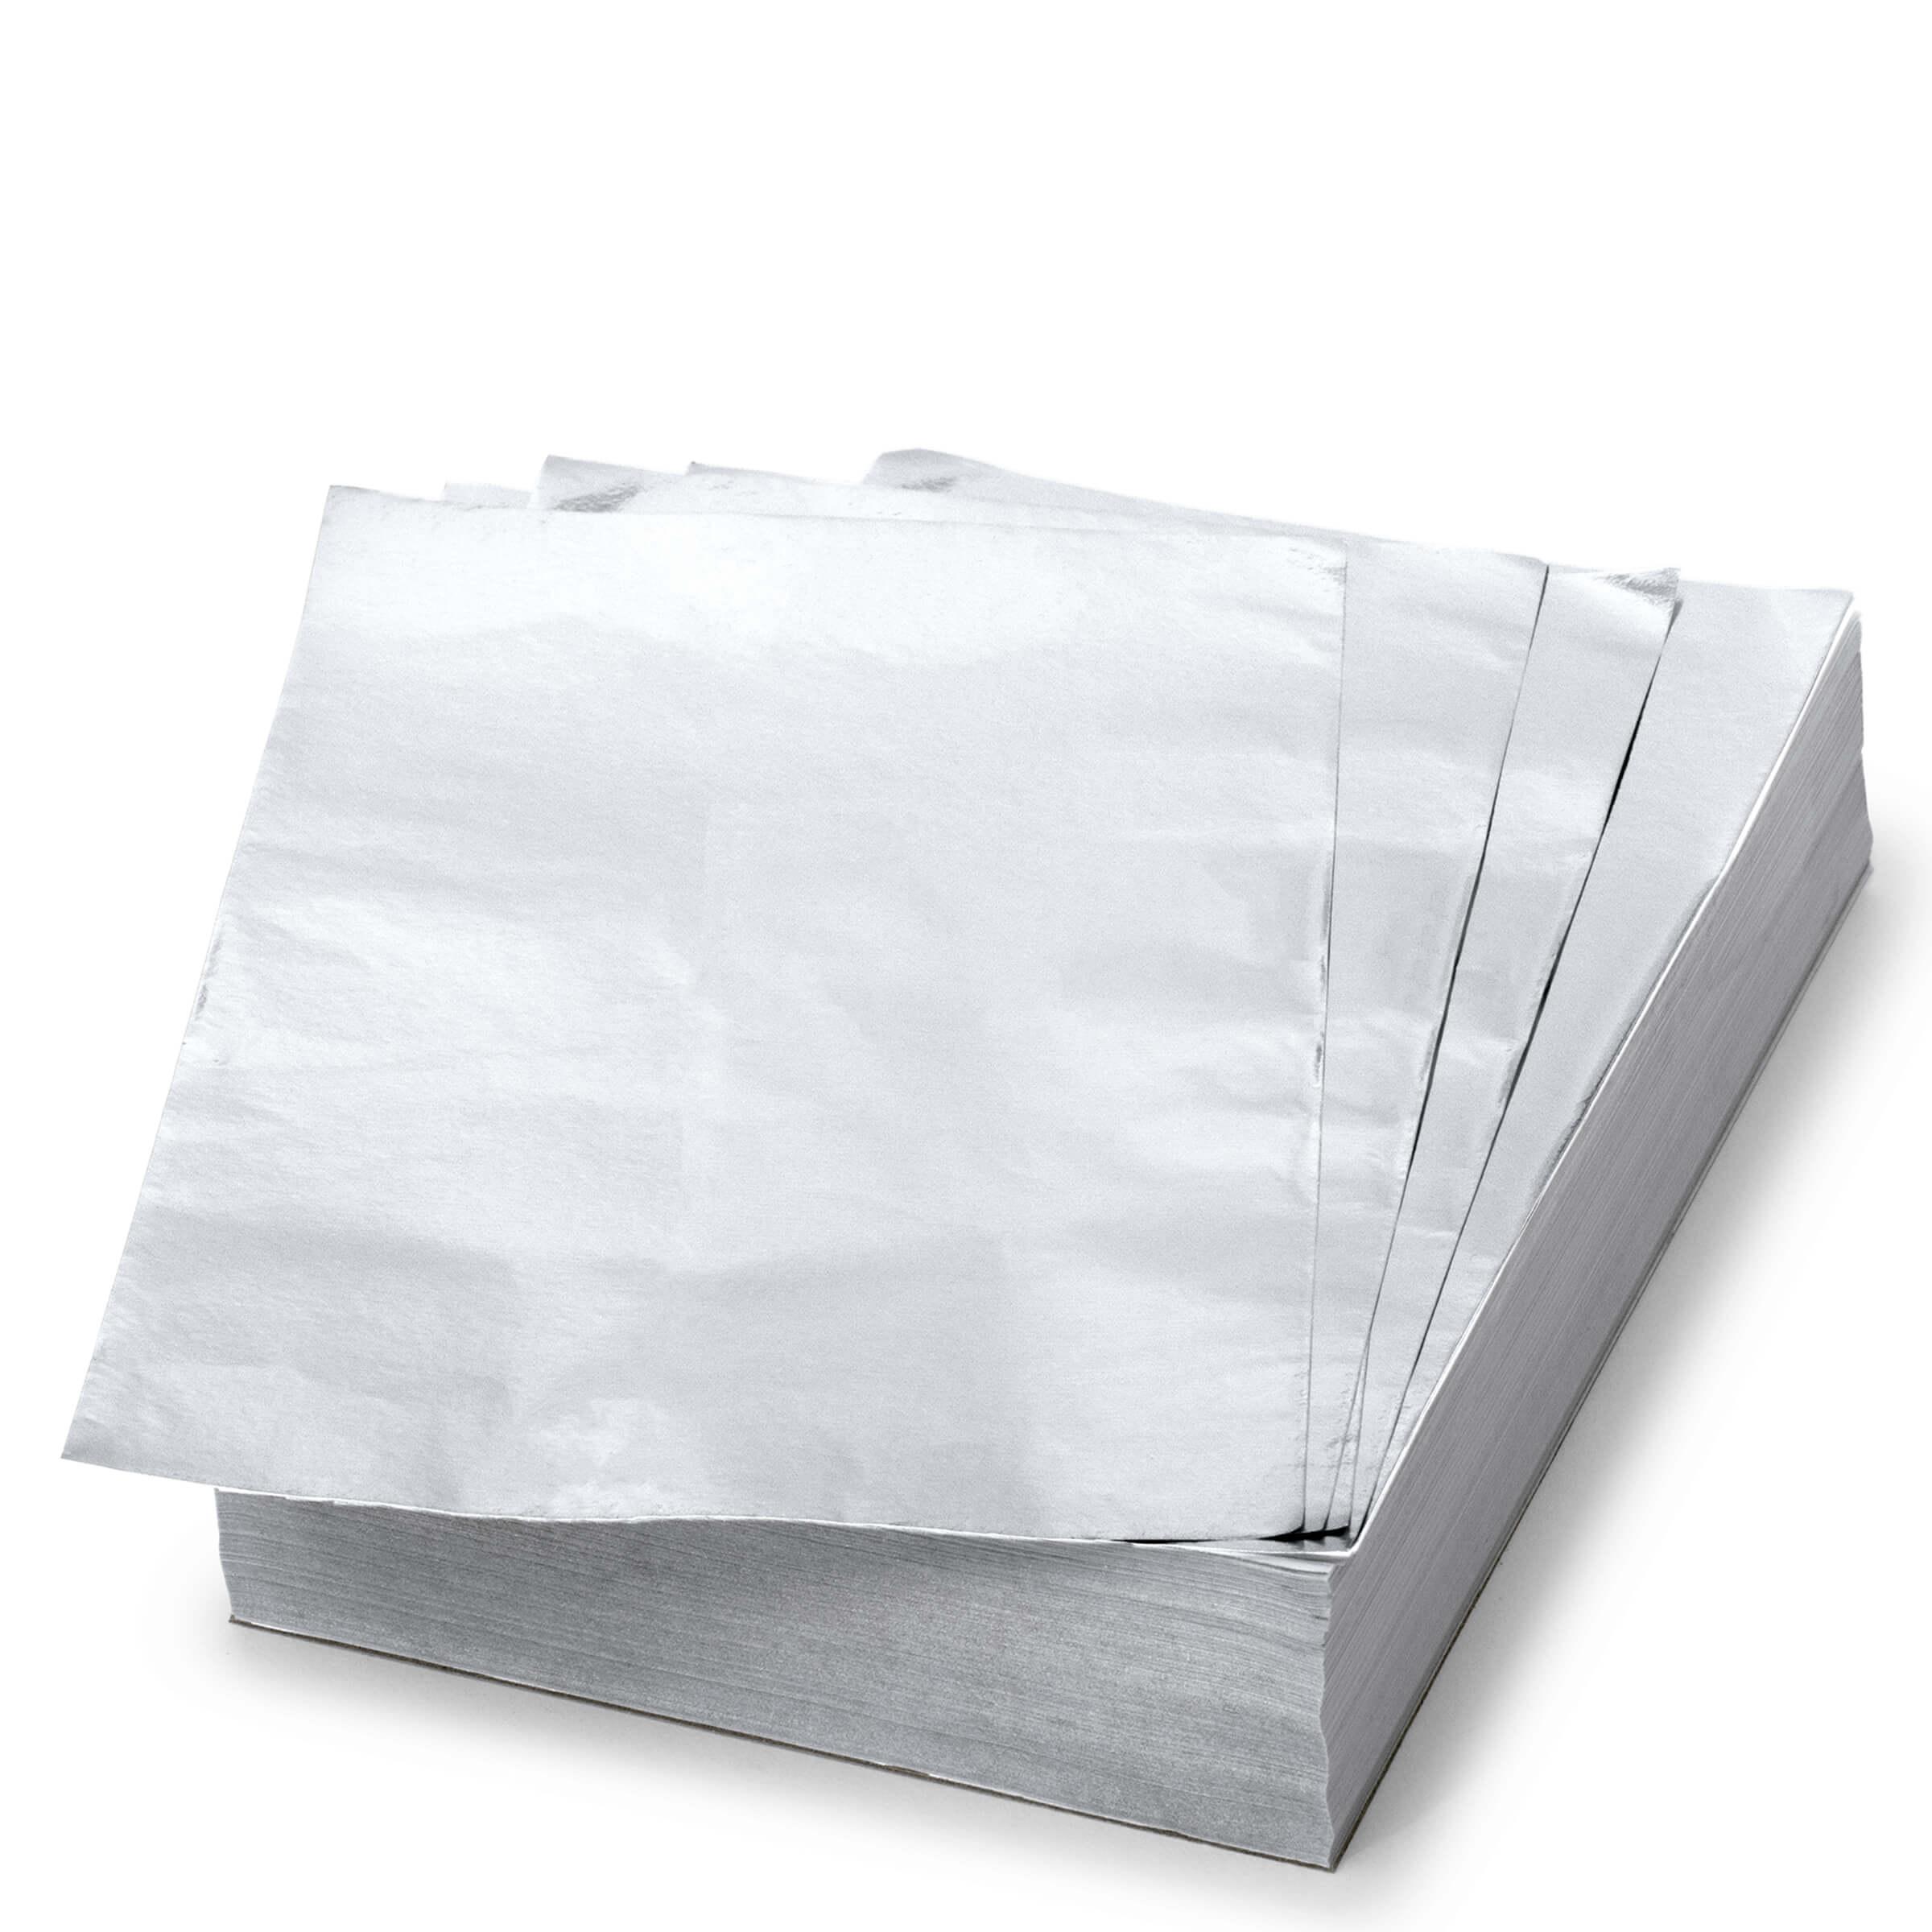 AL-58-50-a-5x8-smooth-foil-light-silver-l.jpg